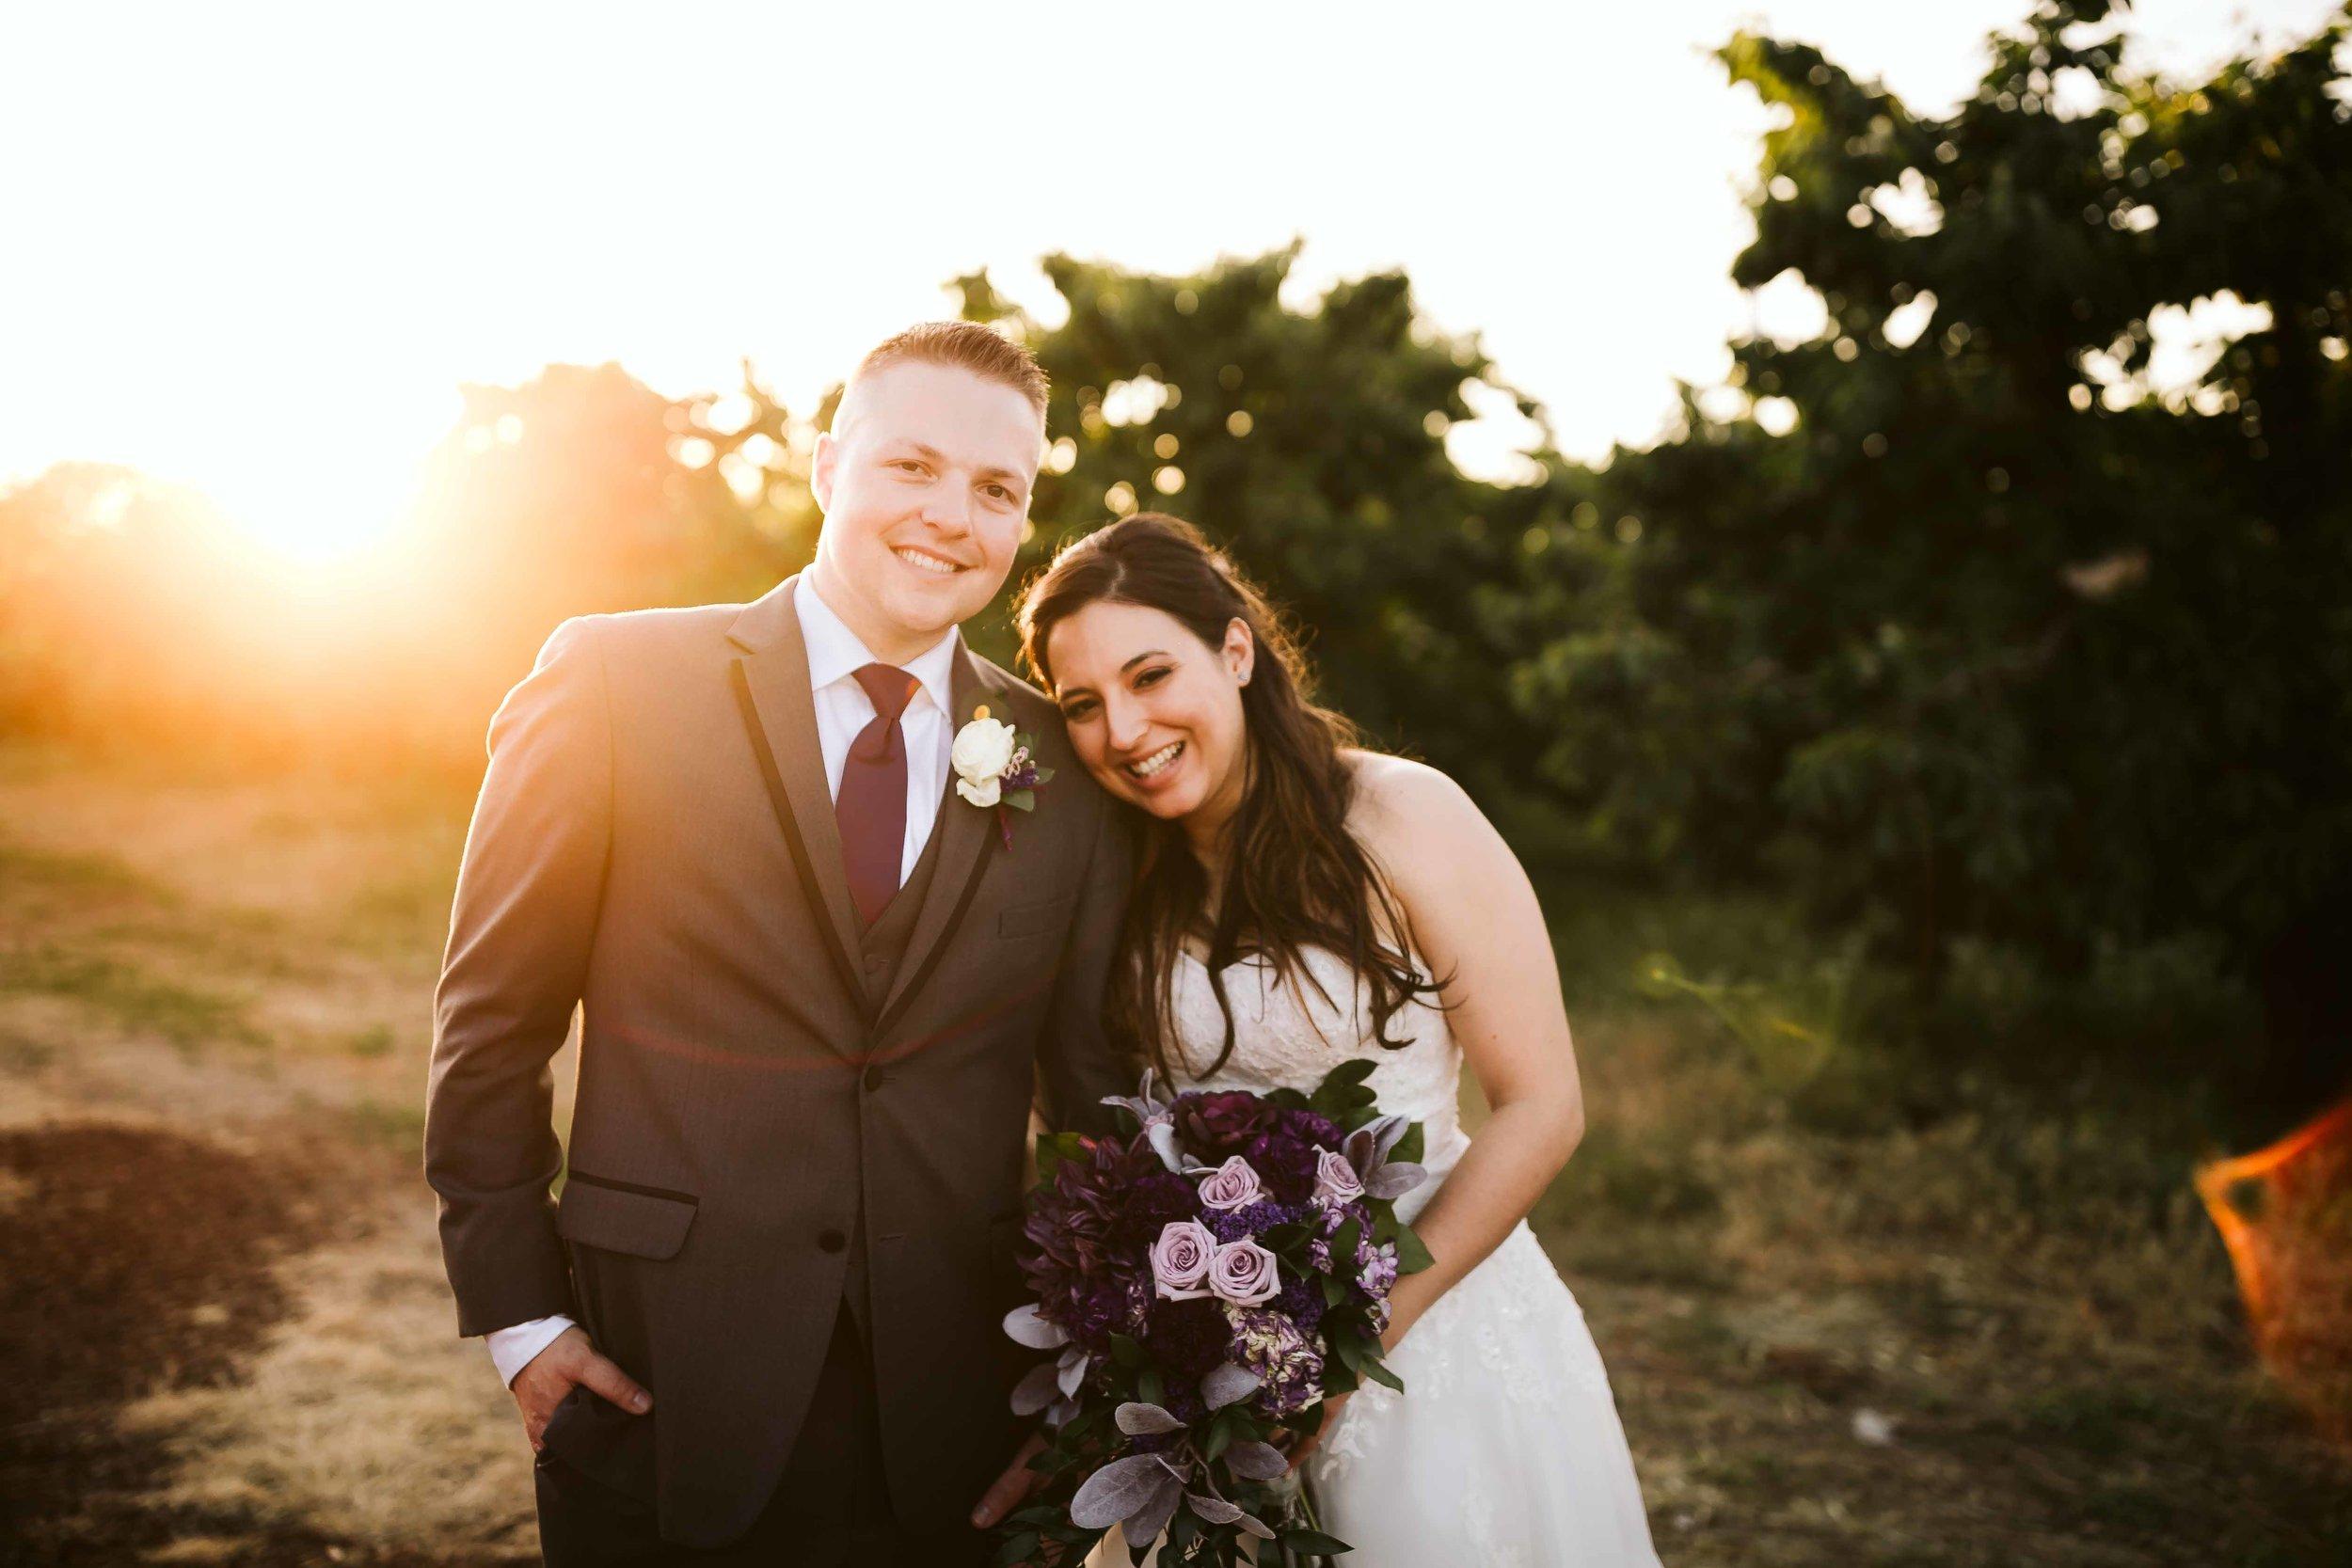 tuncannon-cellars-wedding-129.jpg